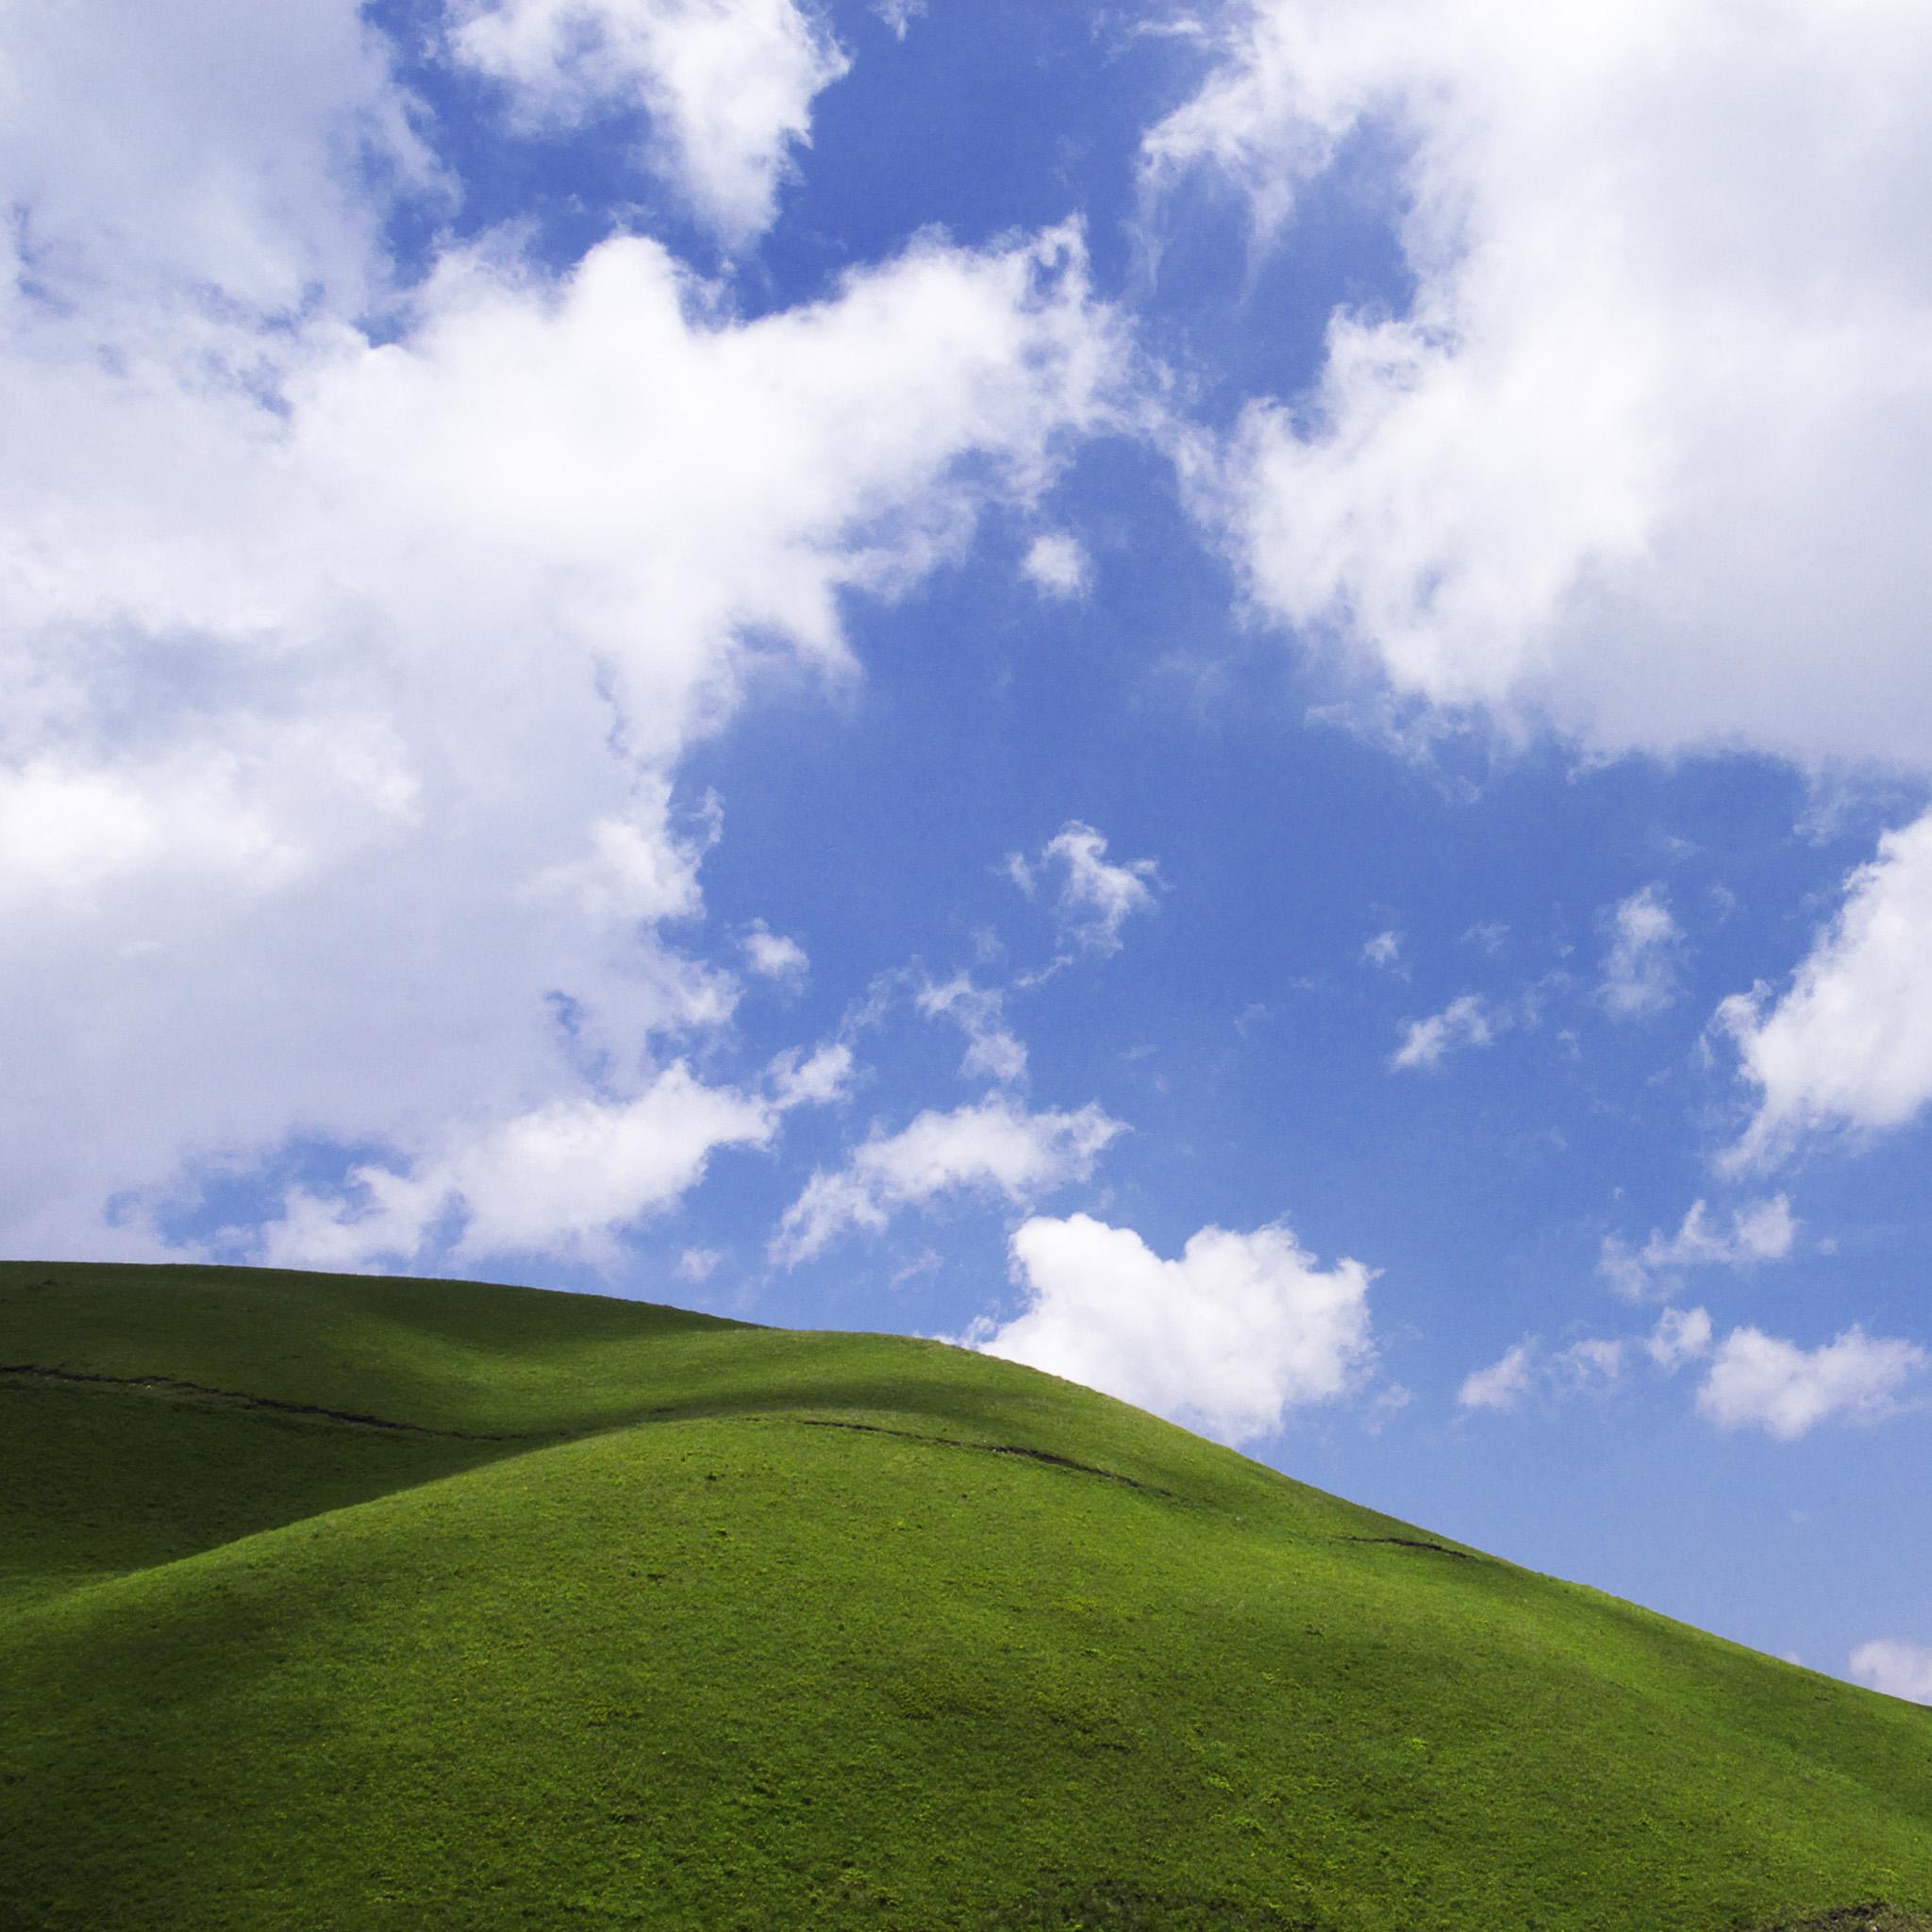 chshii - green grass sky ipad wallpaper